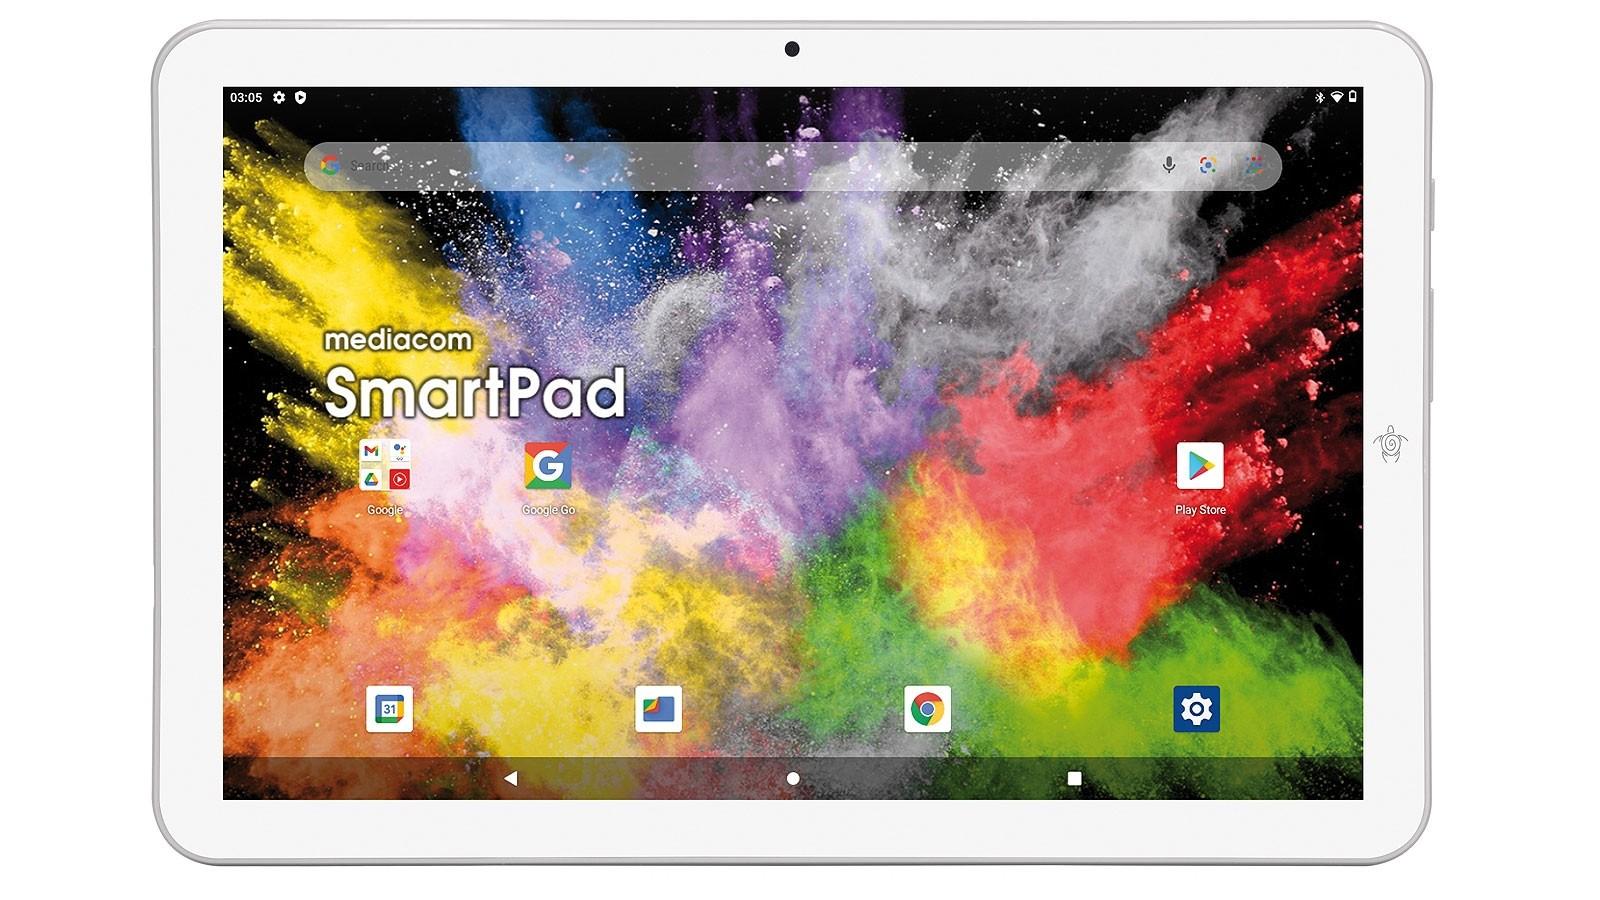 Mediacom SmartPad M-SP1HY4G tablet 4G LTE 32 GB 25,6 cm (10.1